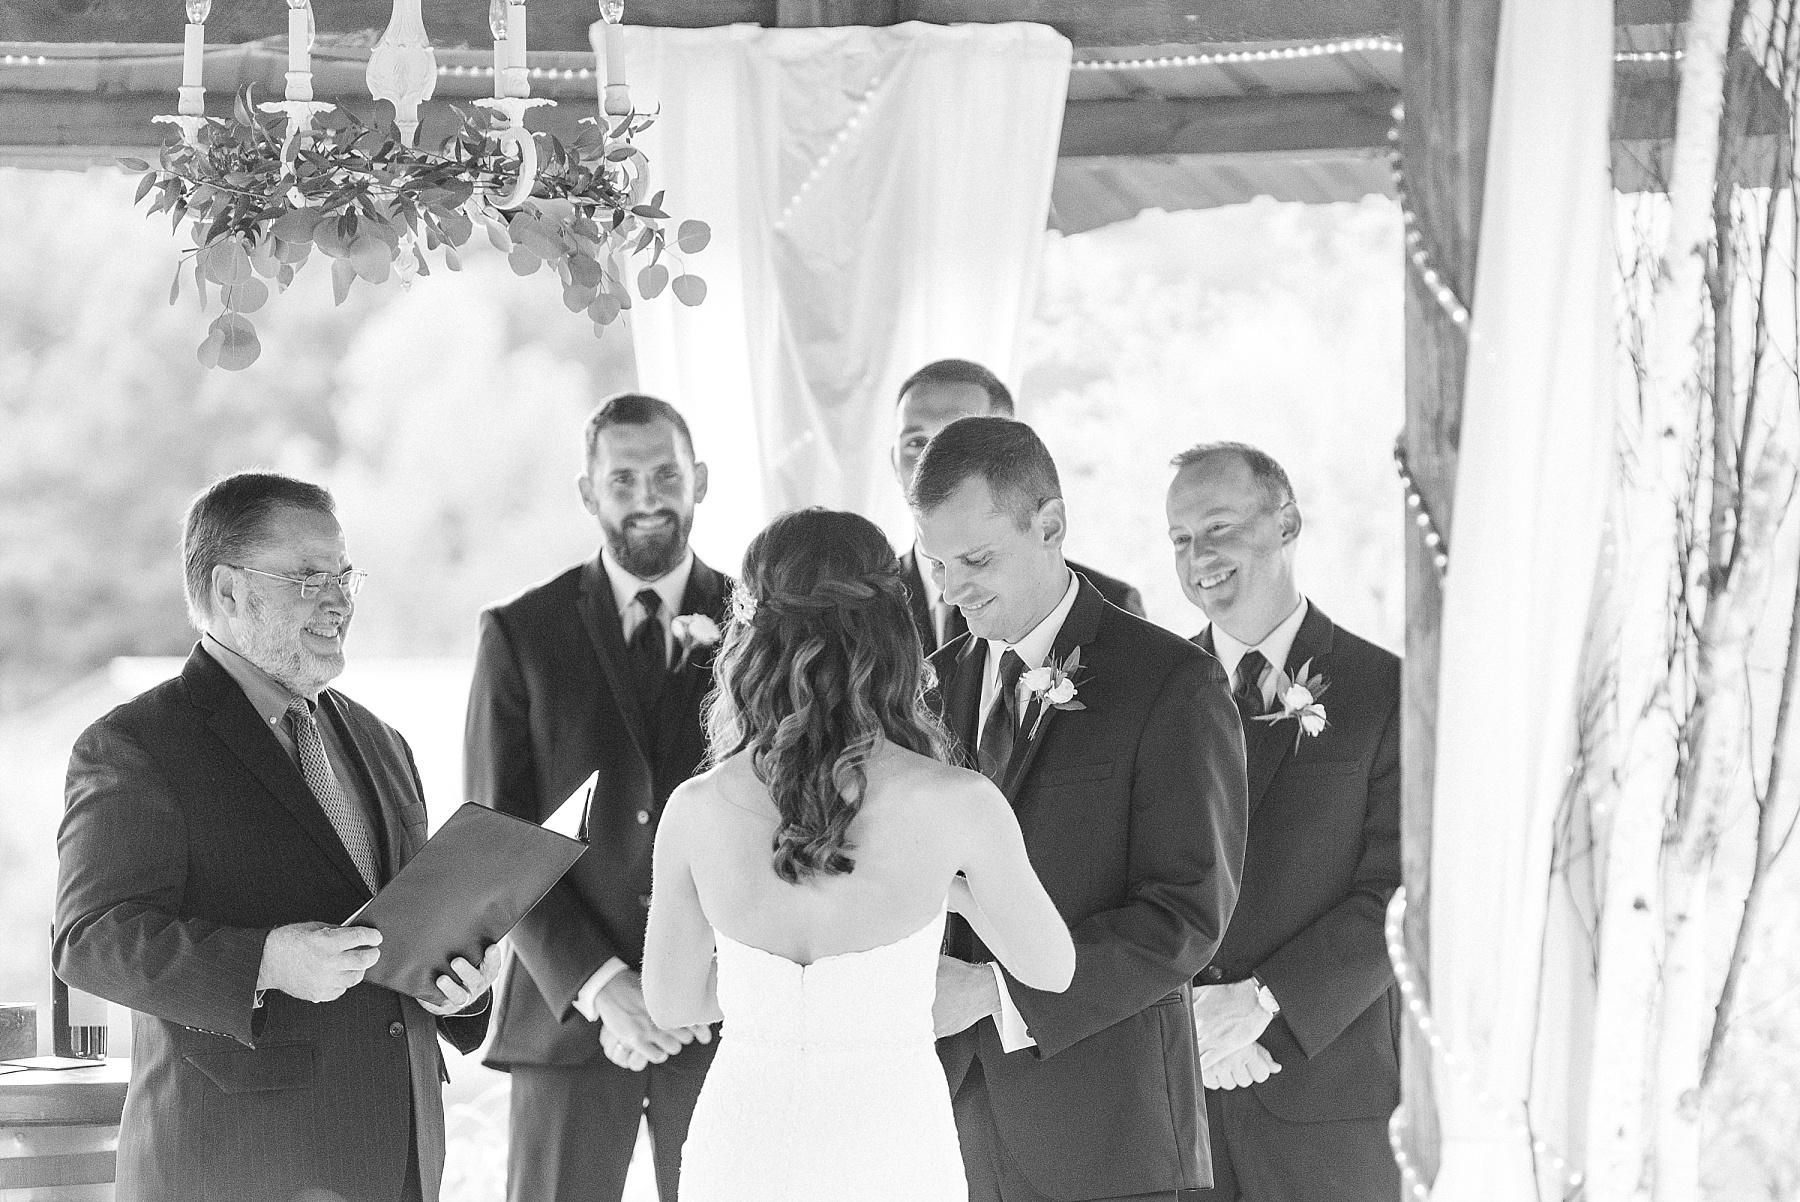 Romantic Summer Sunset Wedding Ceremony at Little Piney Lodge St. Louis Missouri by Kelsi Kliethermes Photography Fine Art Photographer_0010.jpg